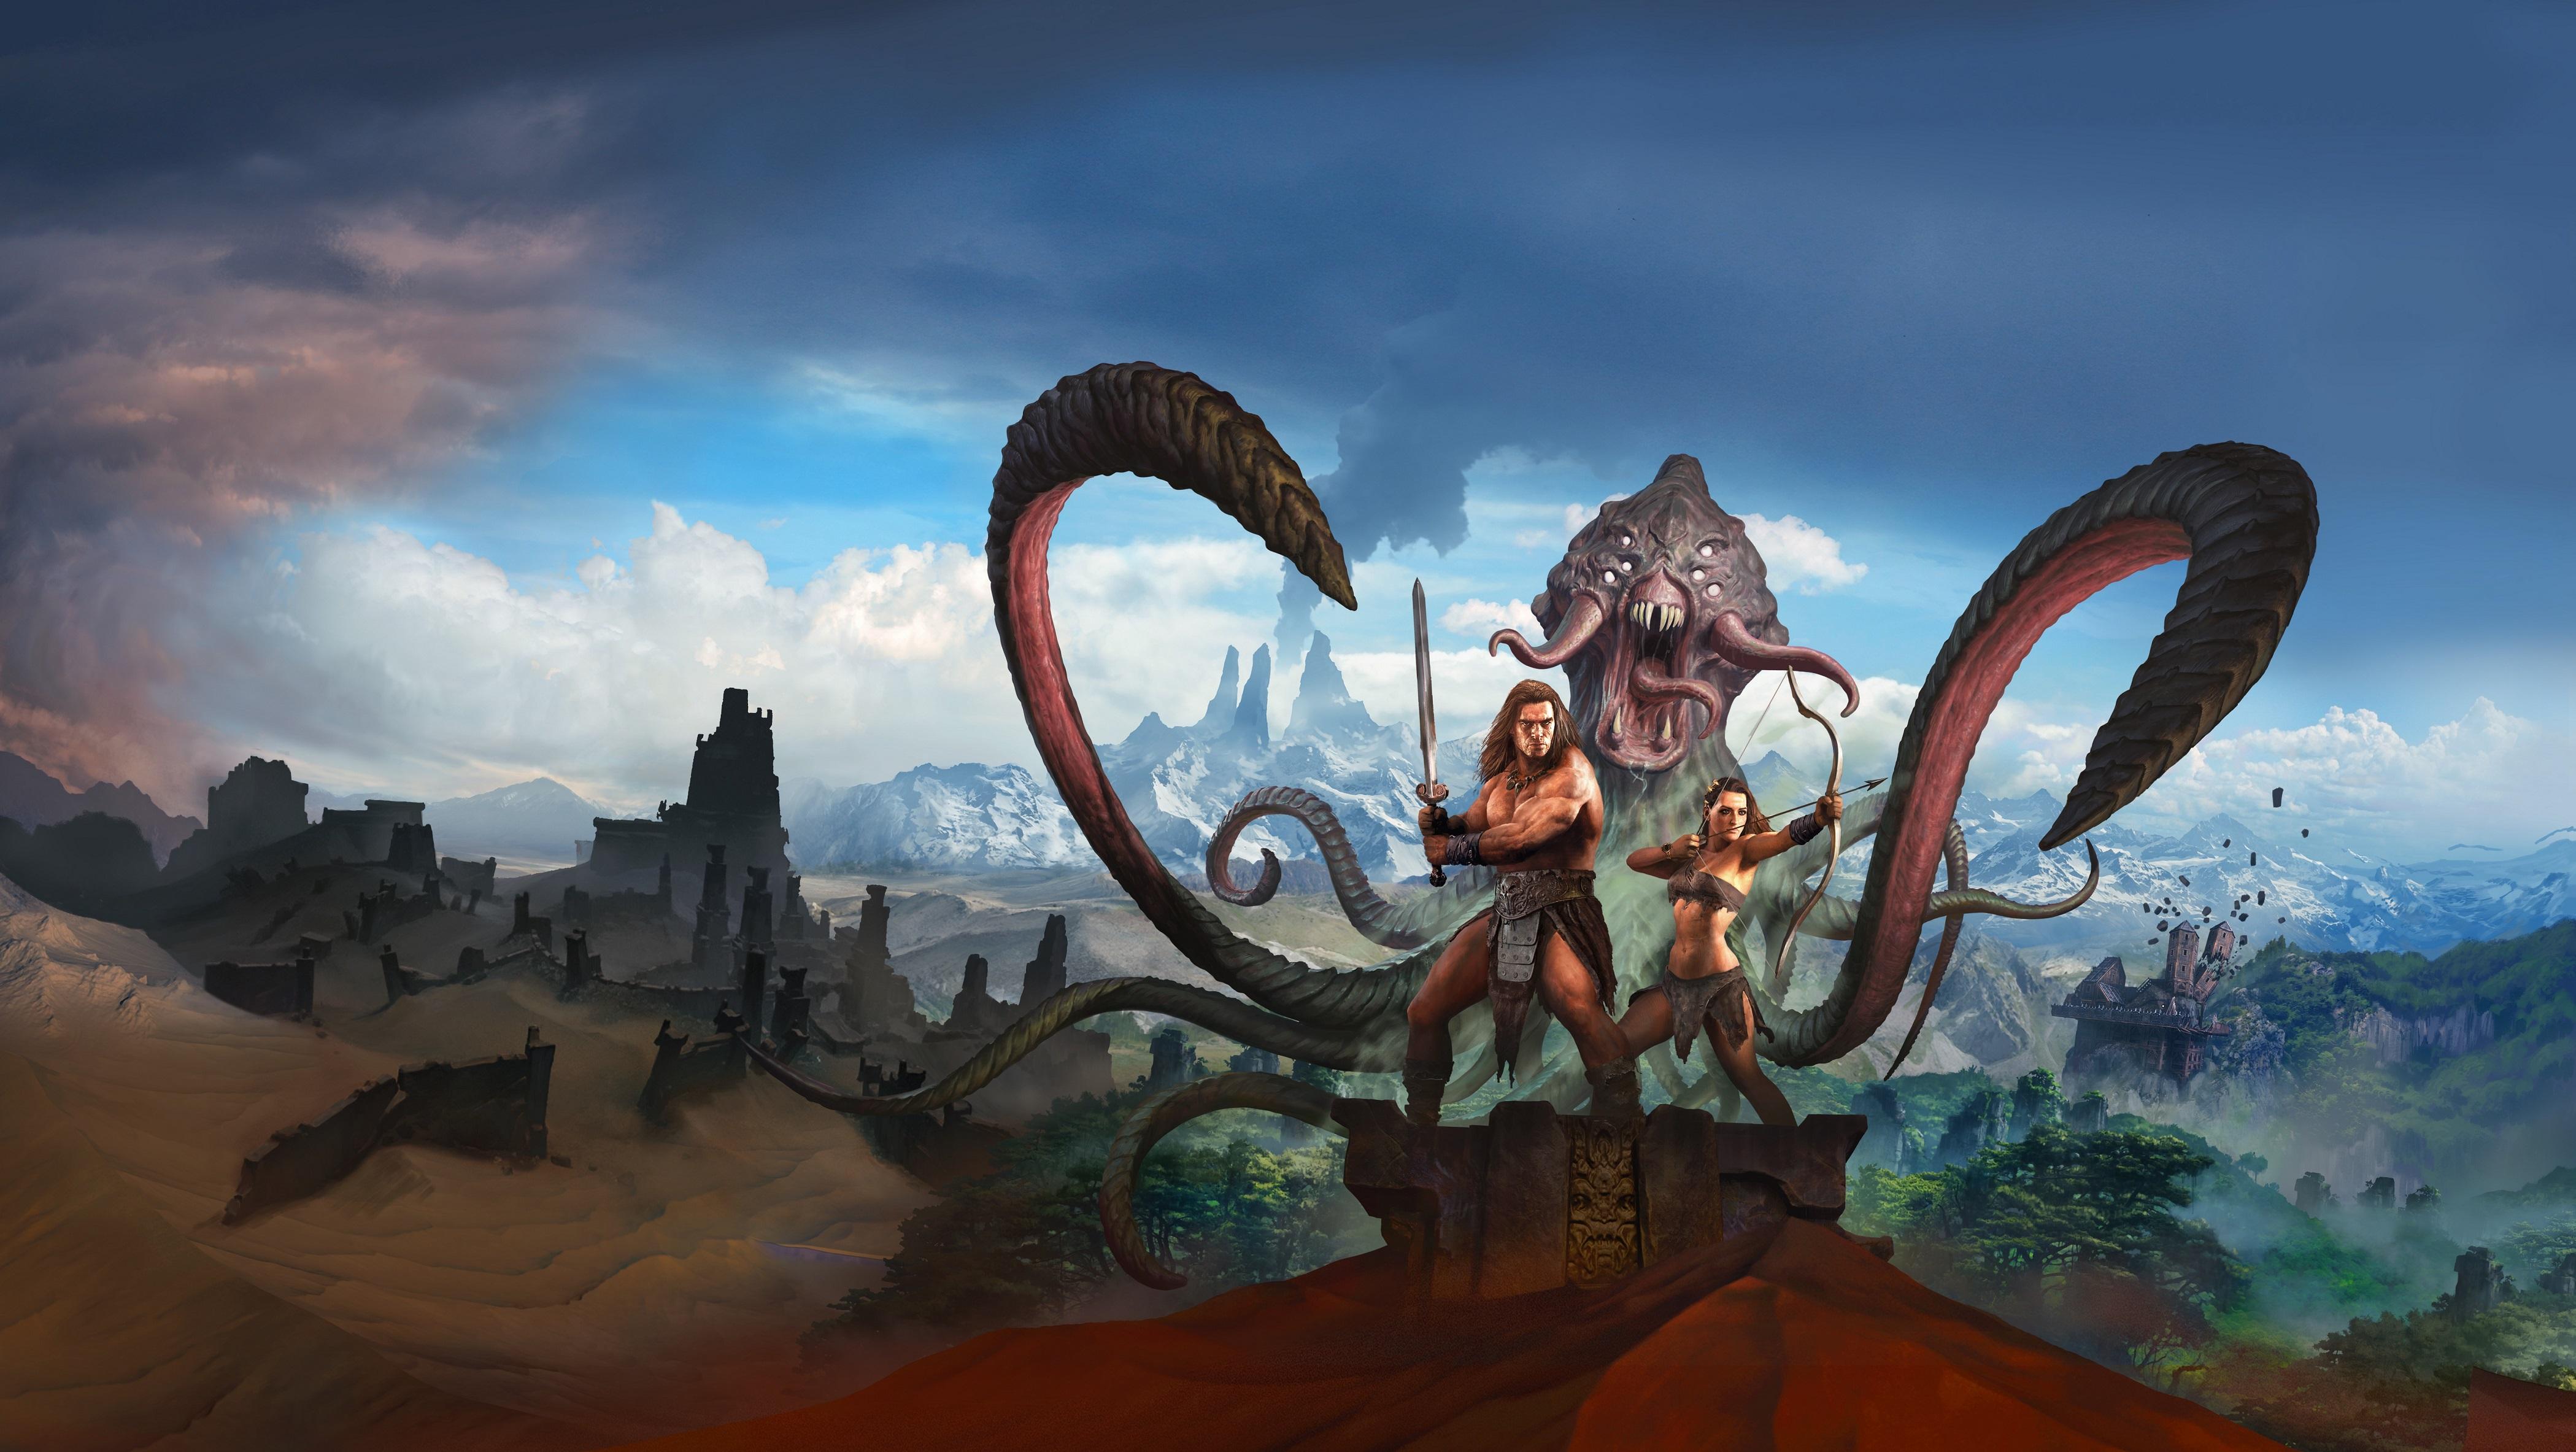 Conan exiles key art hd games 4k wallpapers images - Art wallpaper 2160x3840 ...